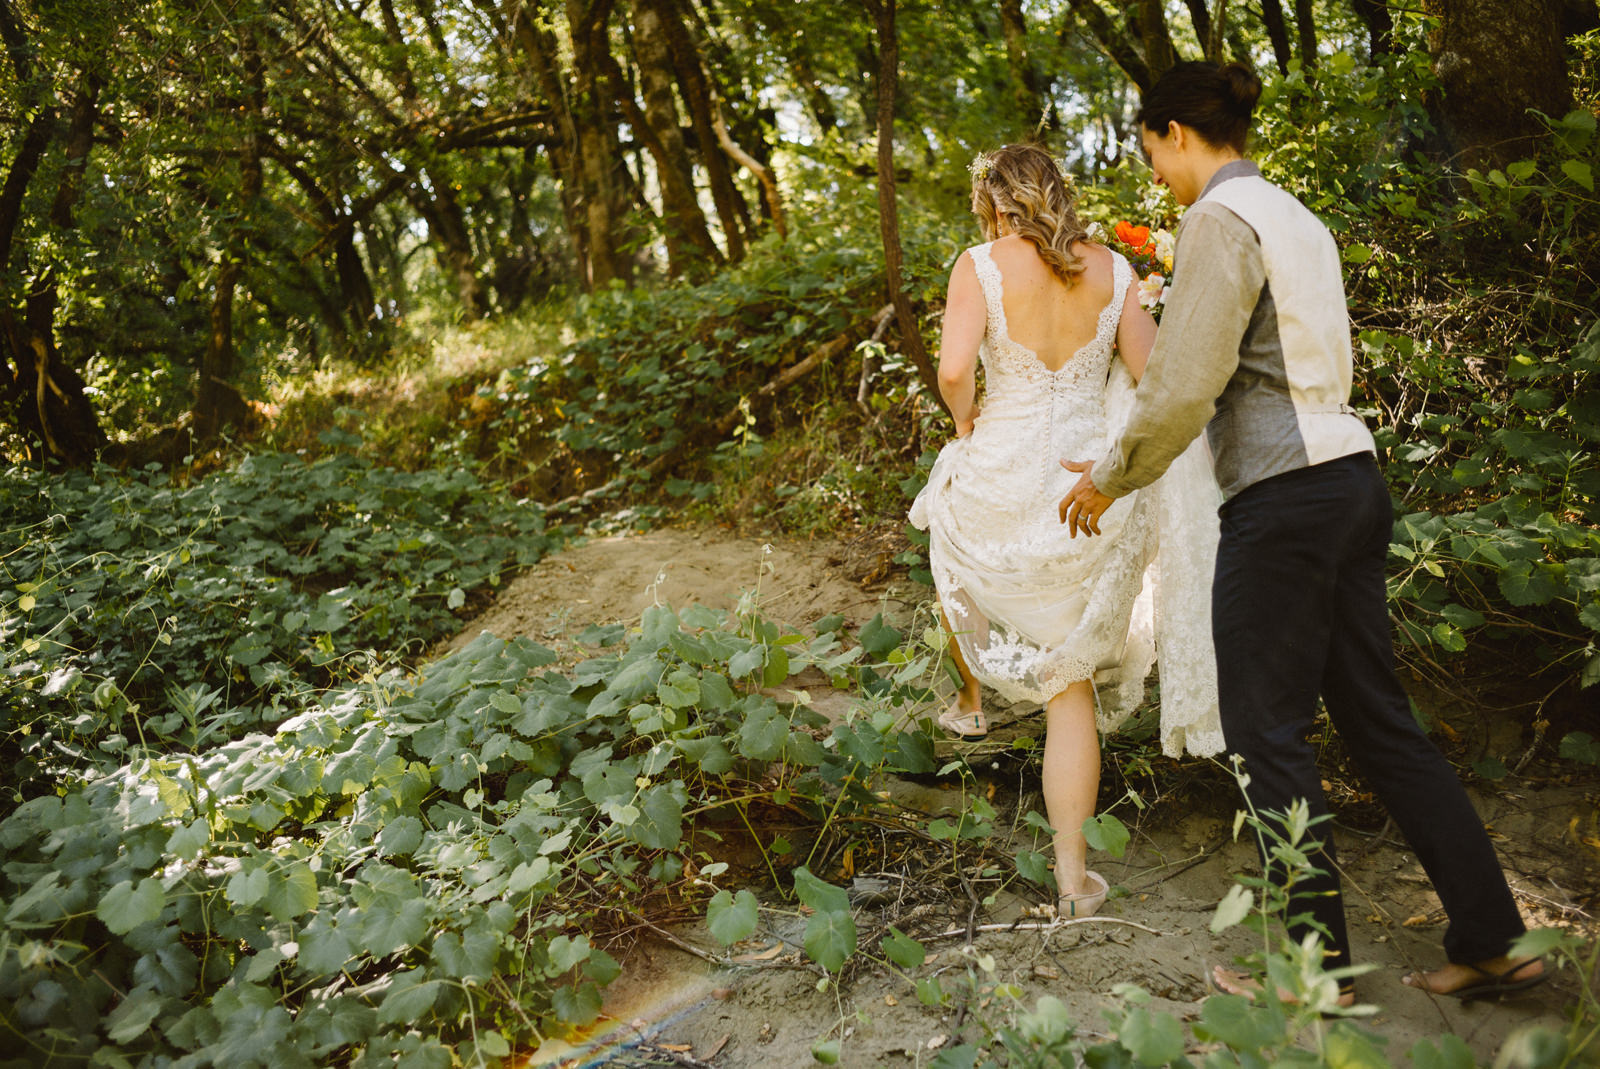 rivers-bend-retreat-wedding-058 RIVER'S BEND RETREAT WEDDING